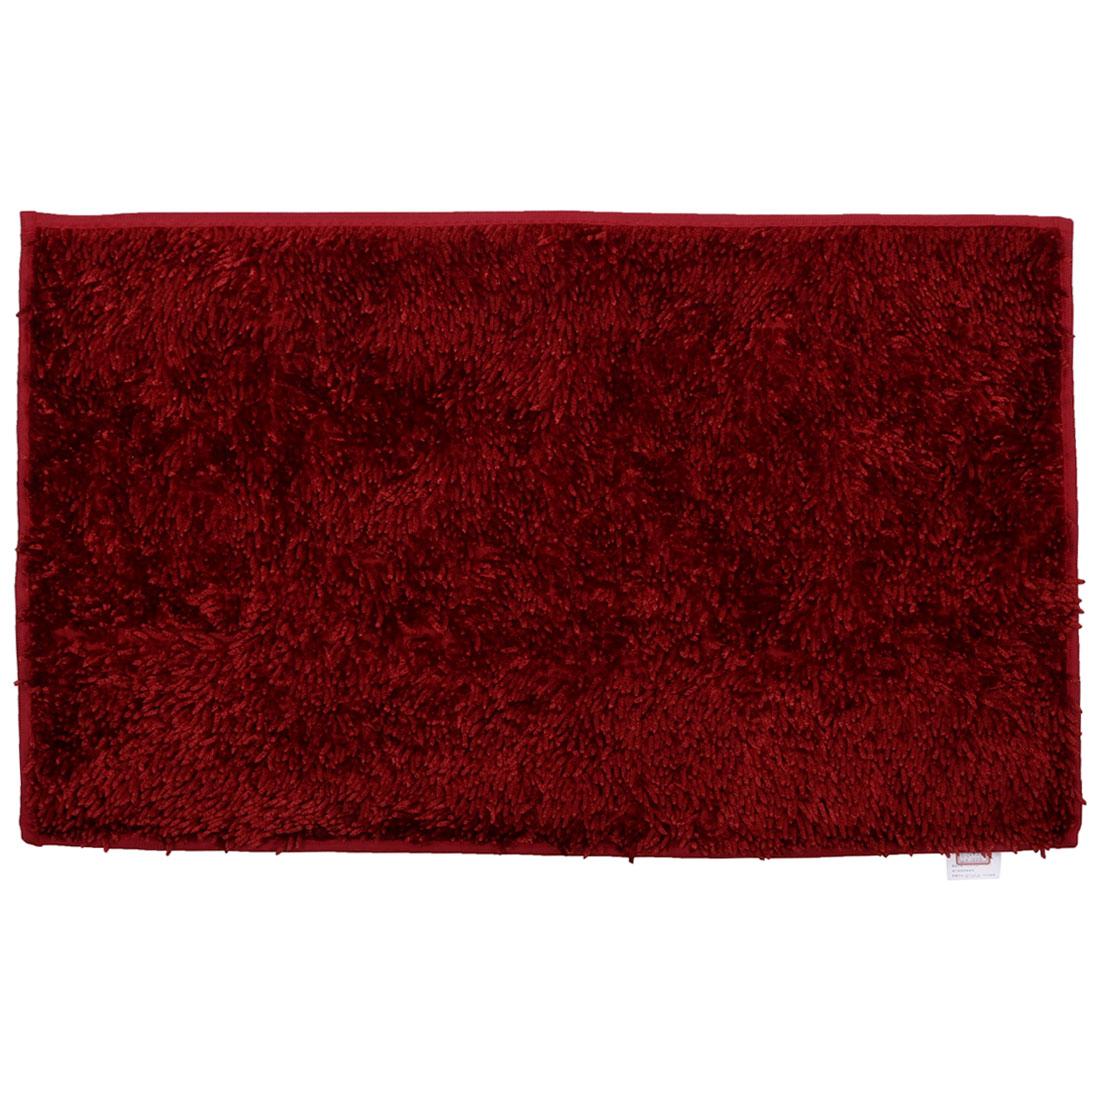 Home Bathroom Non Slip Absorbent Bath Rug Mat Shower Carpet Red 32 x 20 Inches